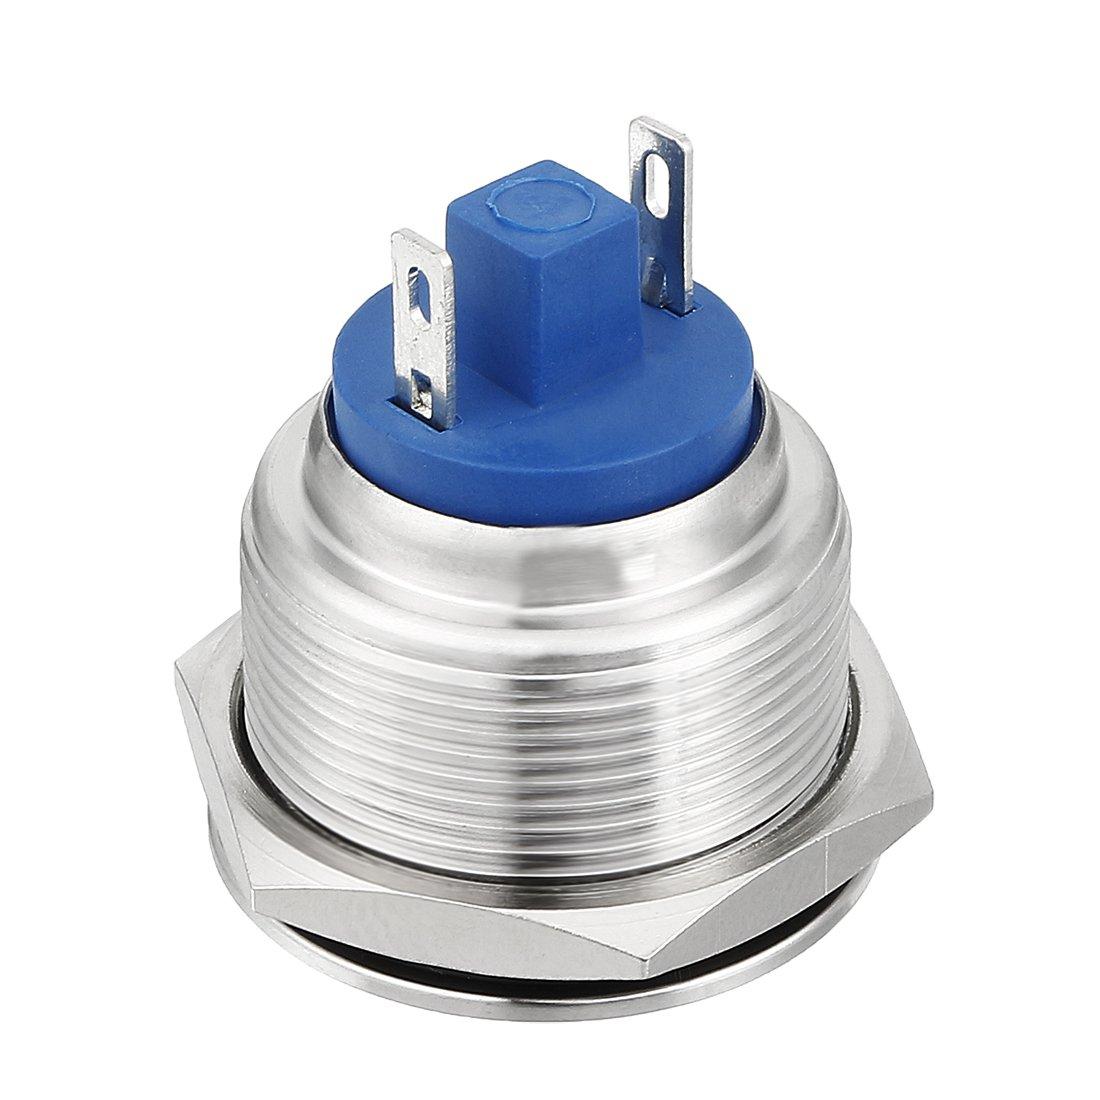 uxcell LED Indicator Light DC 12V 22mm Green Metal Shell Pilot Custom Dash Signal Lamp Flat Head